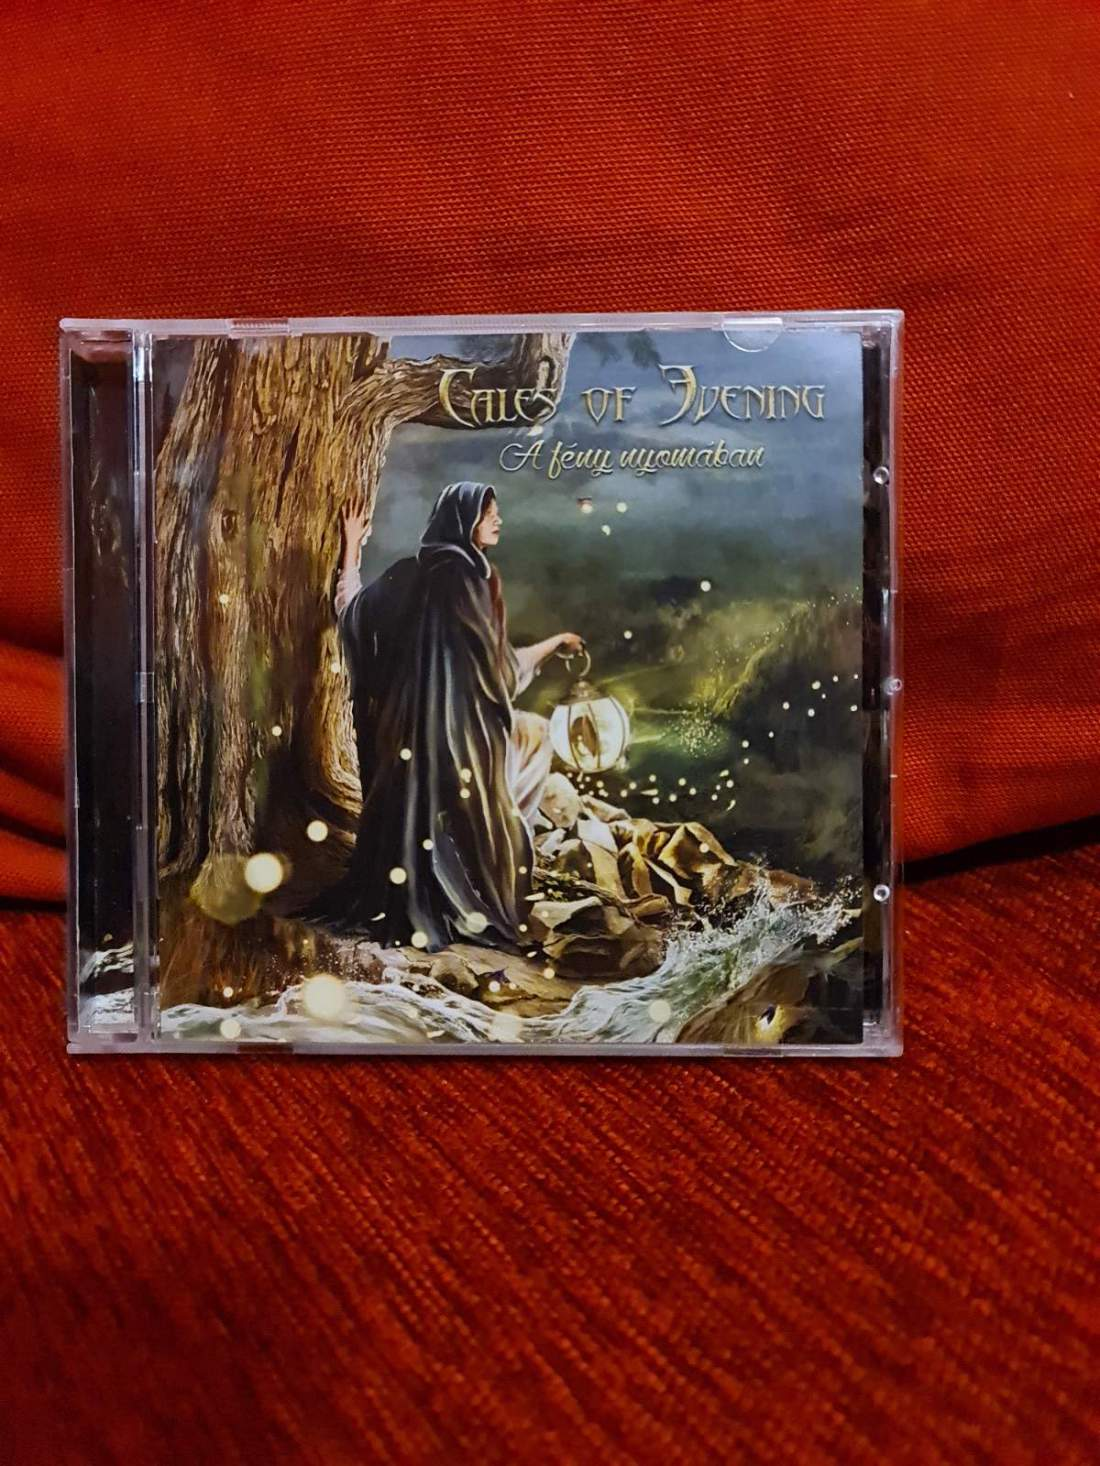 TALES OF EVENING - A FÉNY NYOMÁBAN CD